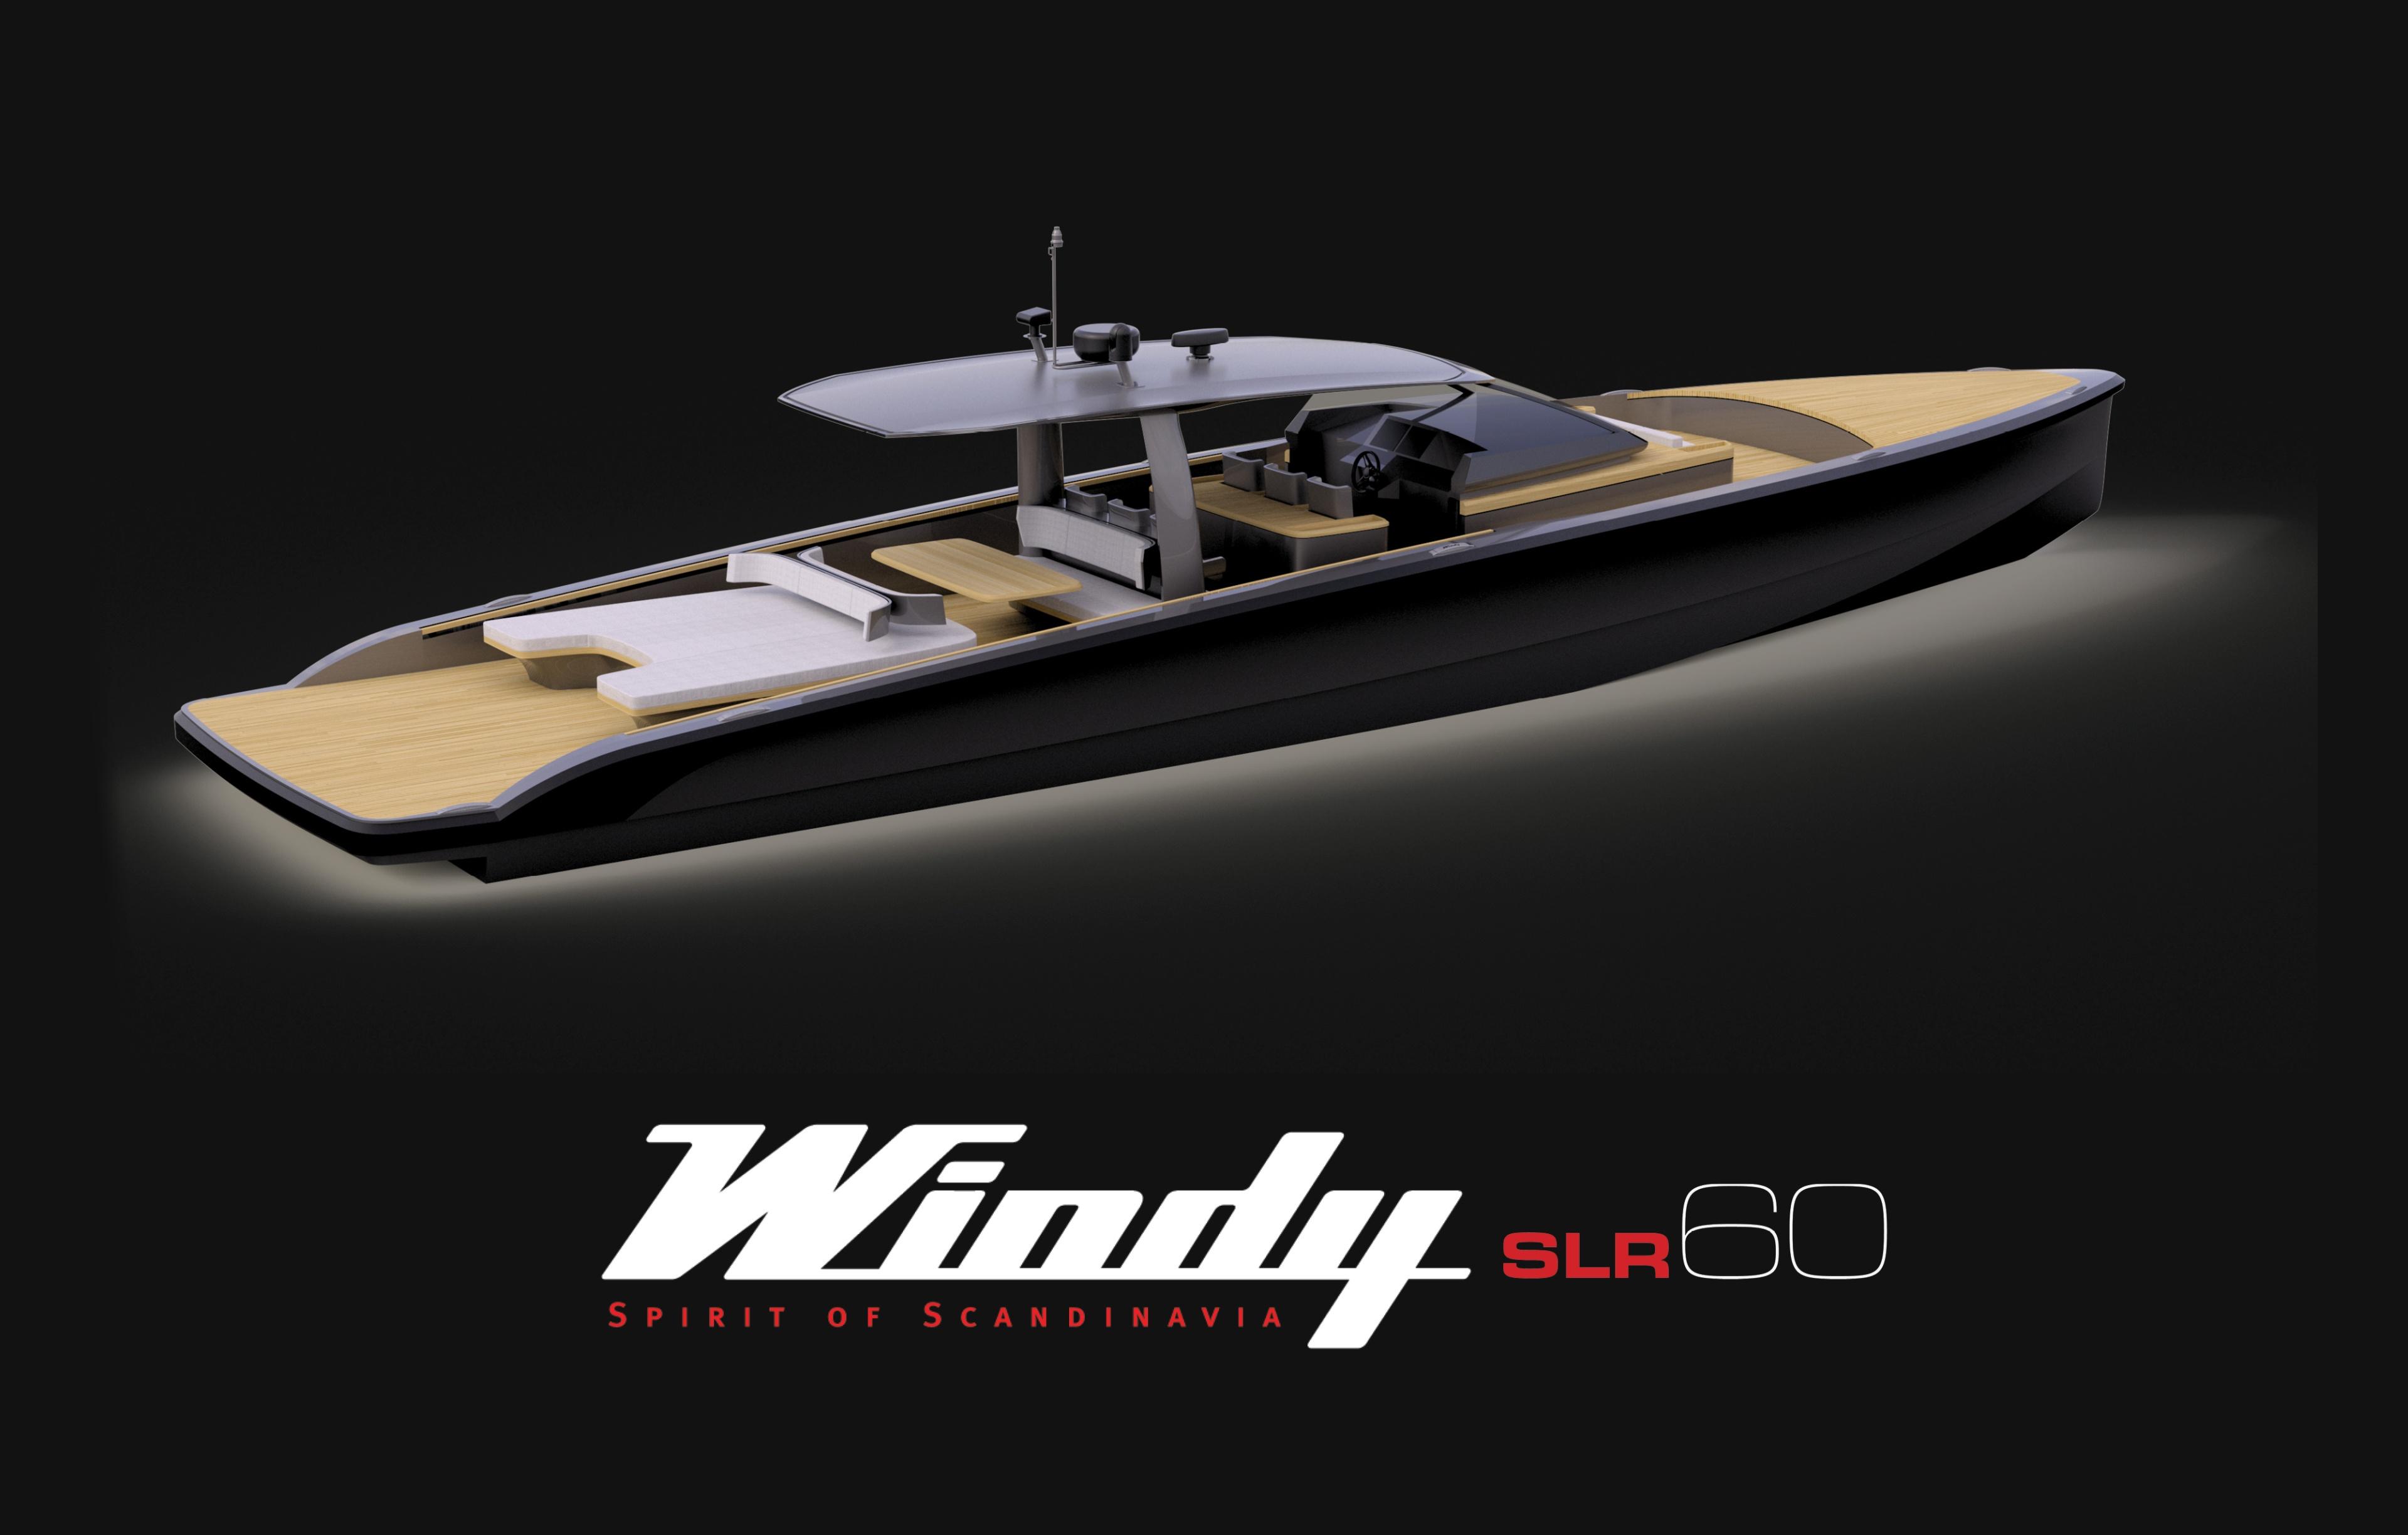 Windy SLR 60